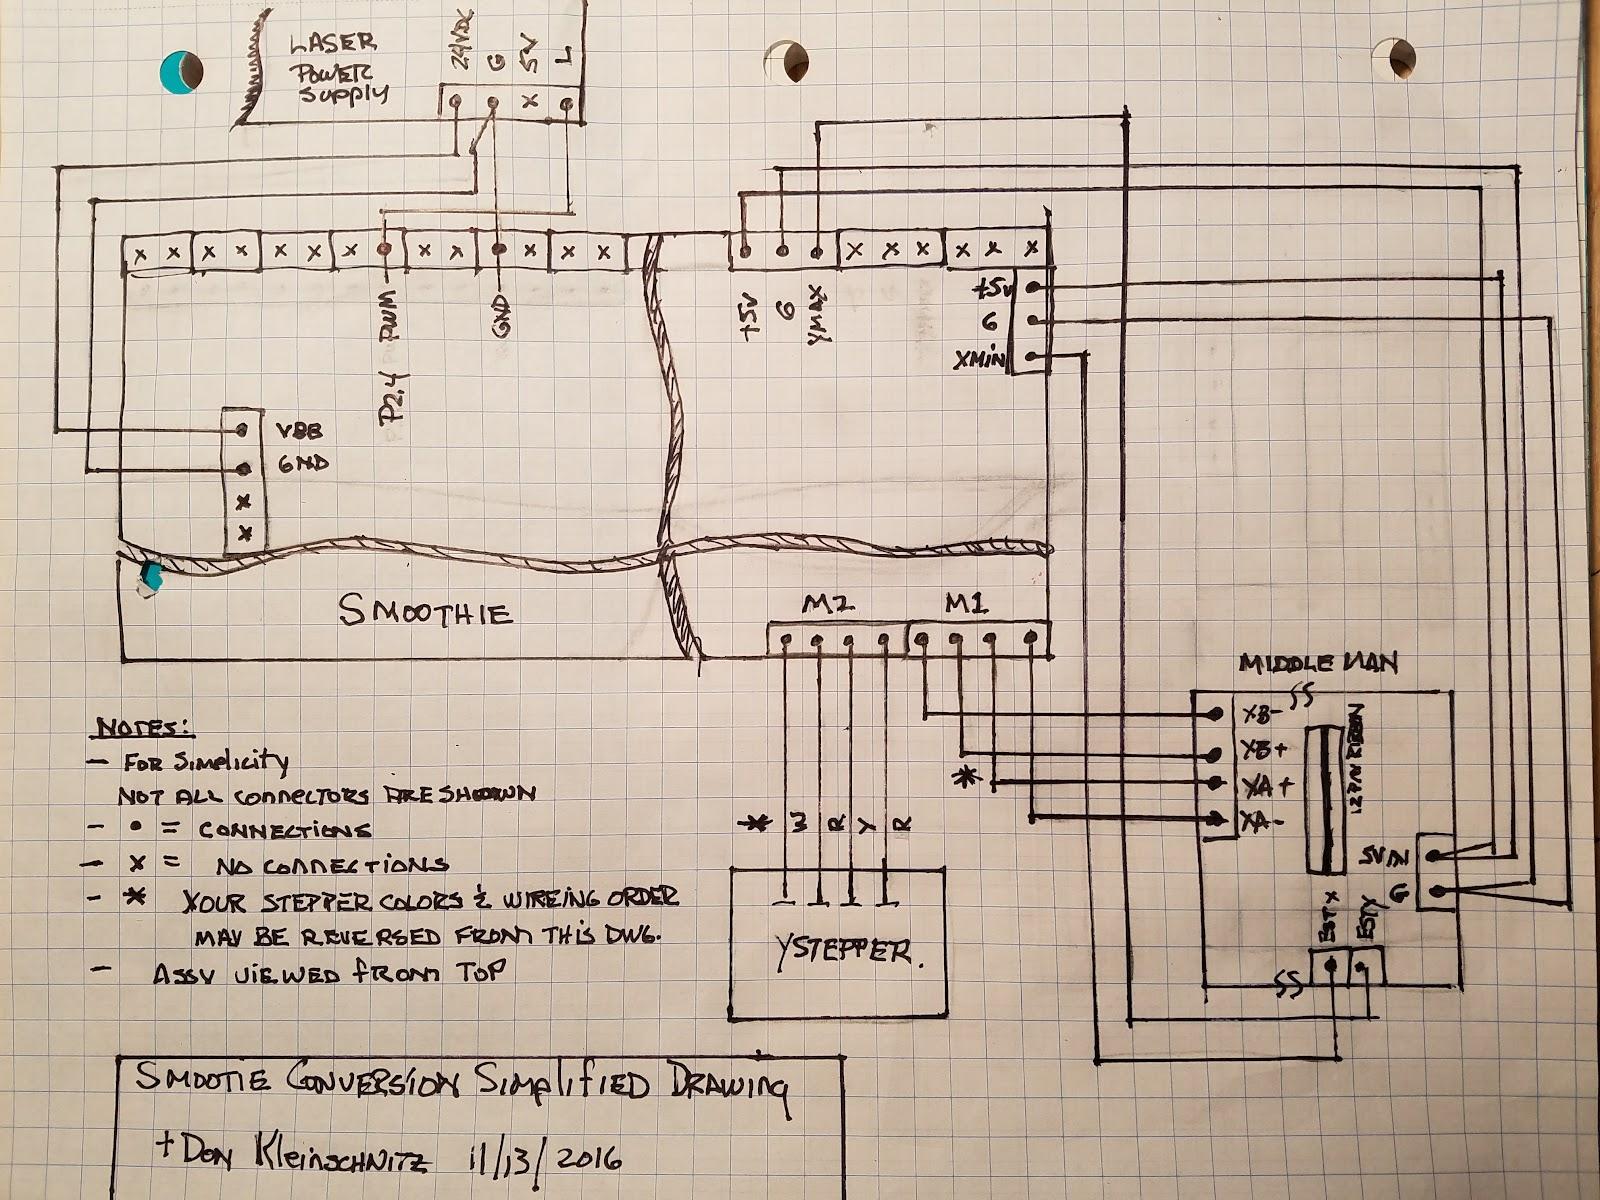 DIAGRAM Honda Civic 1996 Spark Plug Wiring Diagram FULL Version HD Quality Wiring  Diagram - DIAGRAMCLOUDCOMPUTING.TUFFERYJARDINS.FR [ 1200 x 1600 Pixel ]